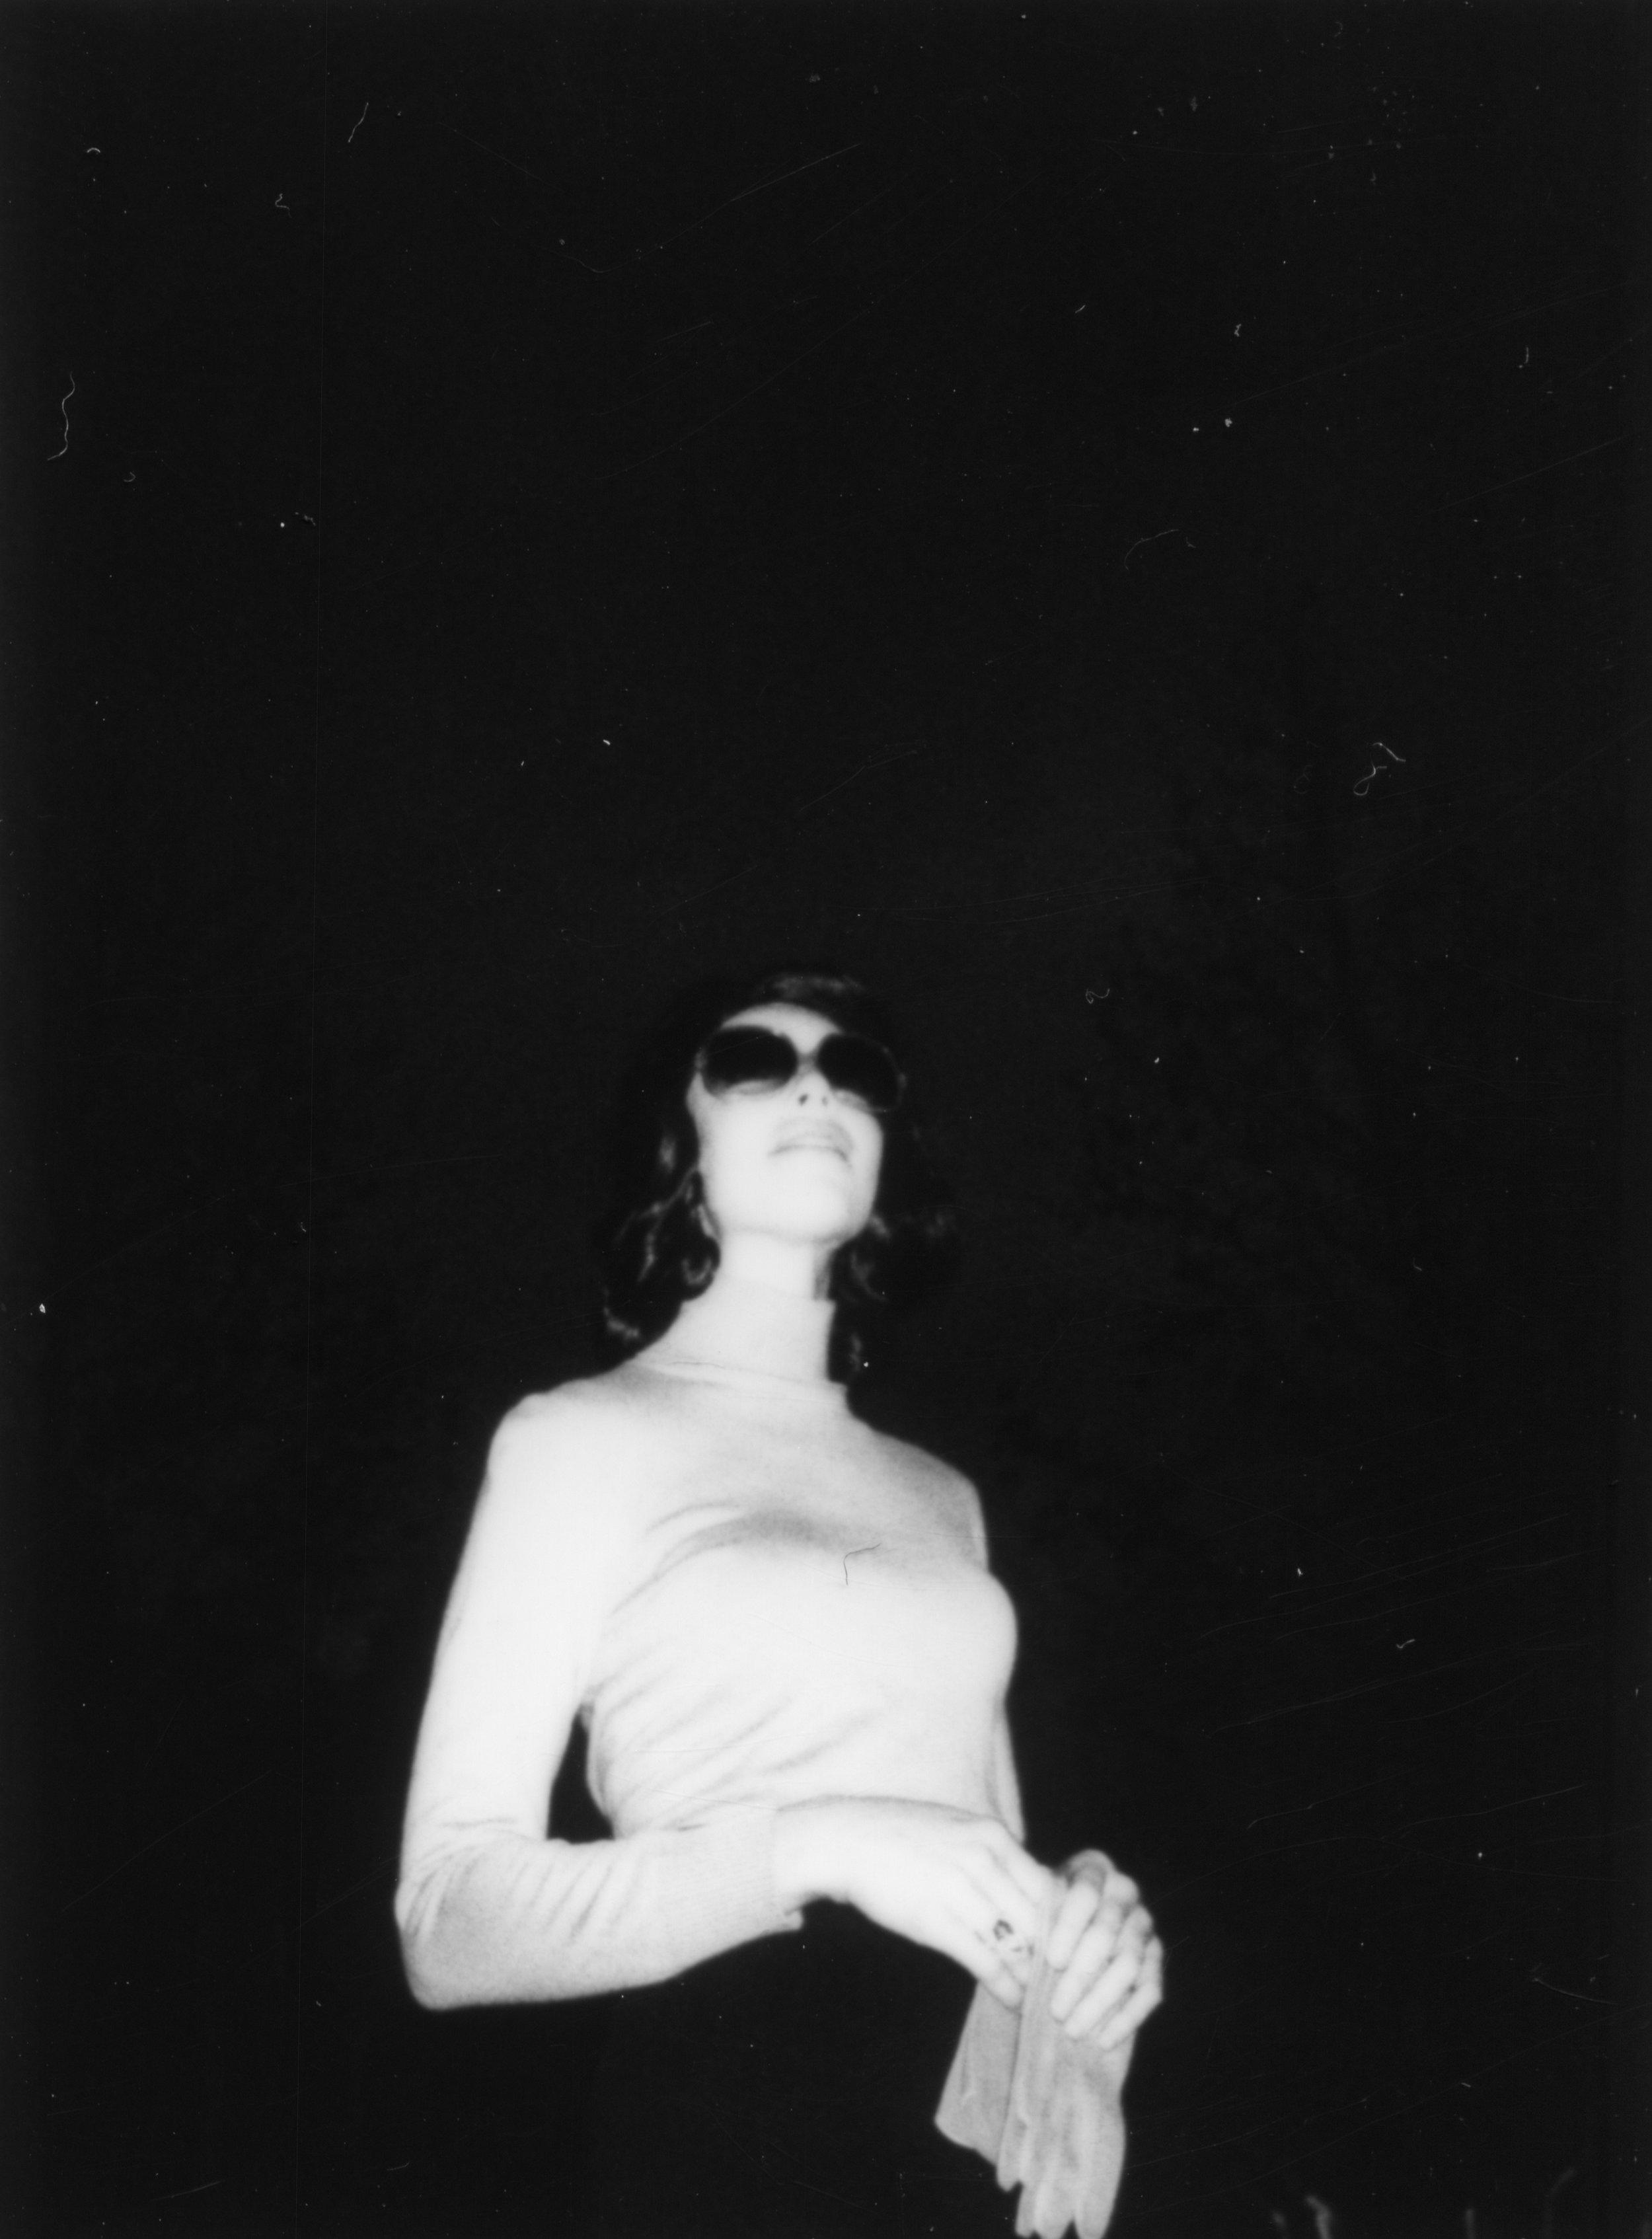 Arlington_PolaroidScan_09.jpg